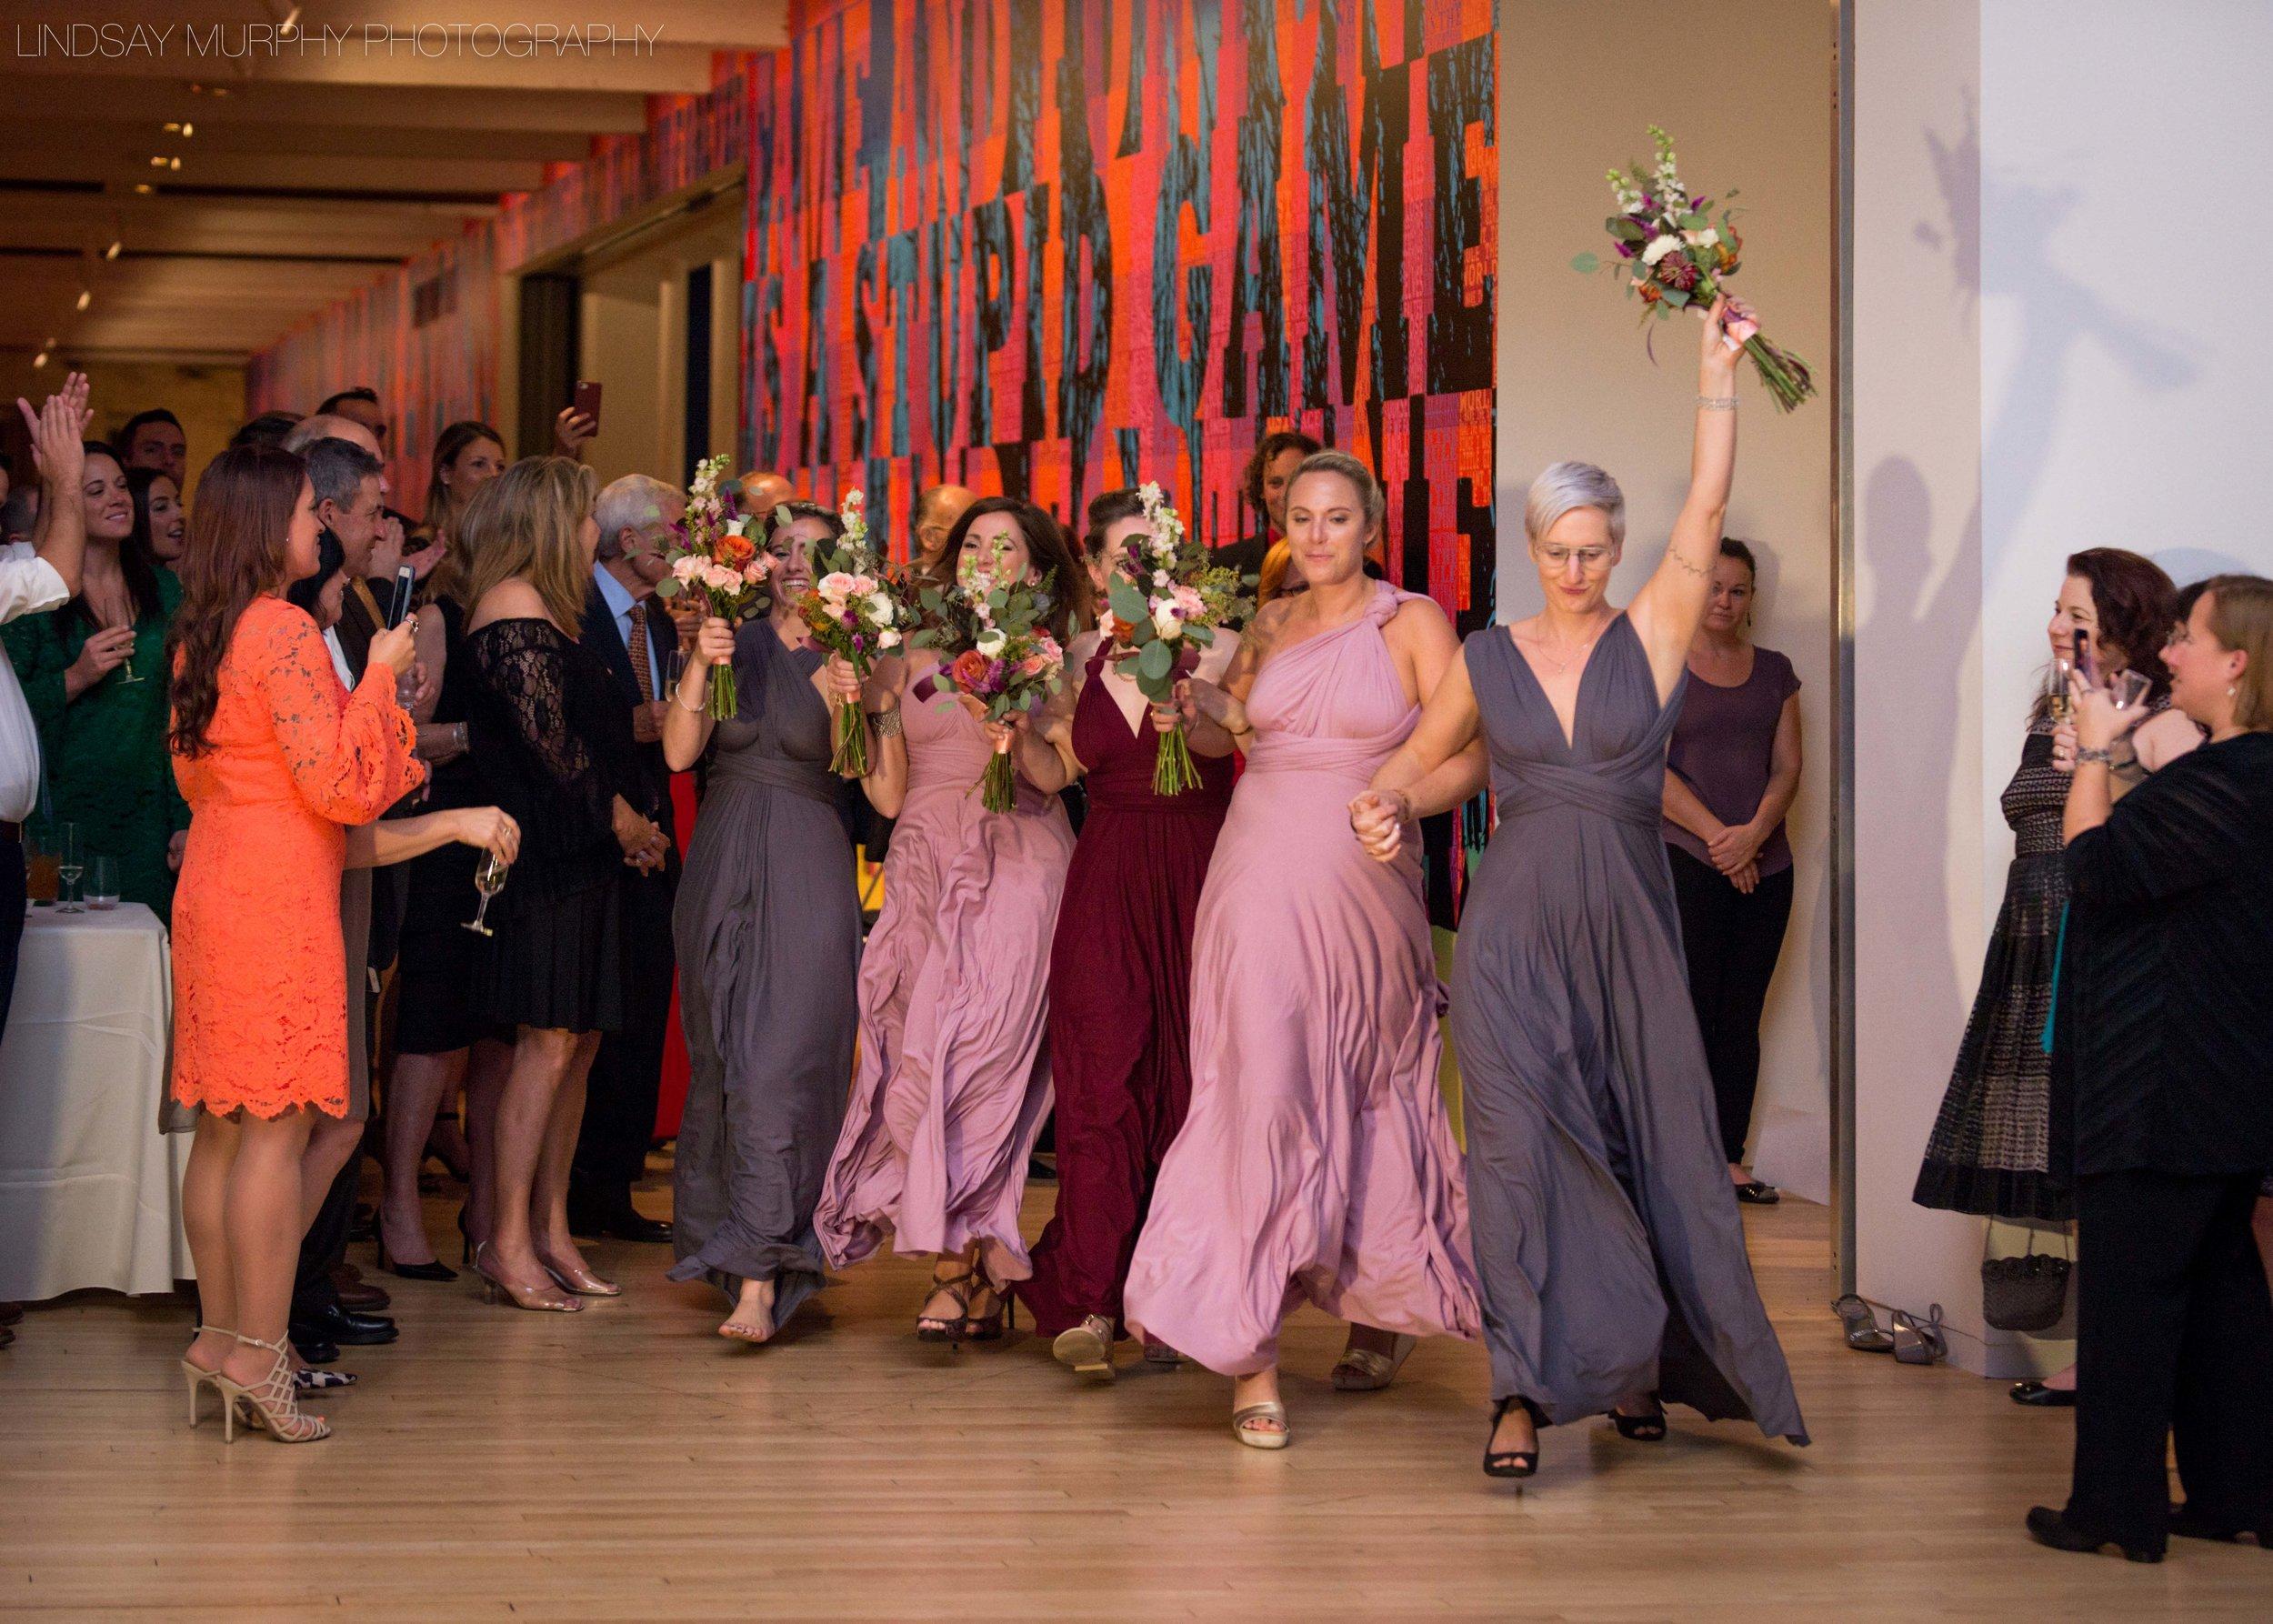 New_England_wedding-29.jpg